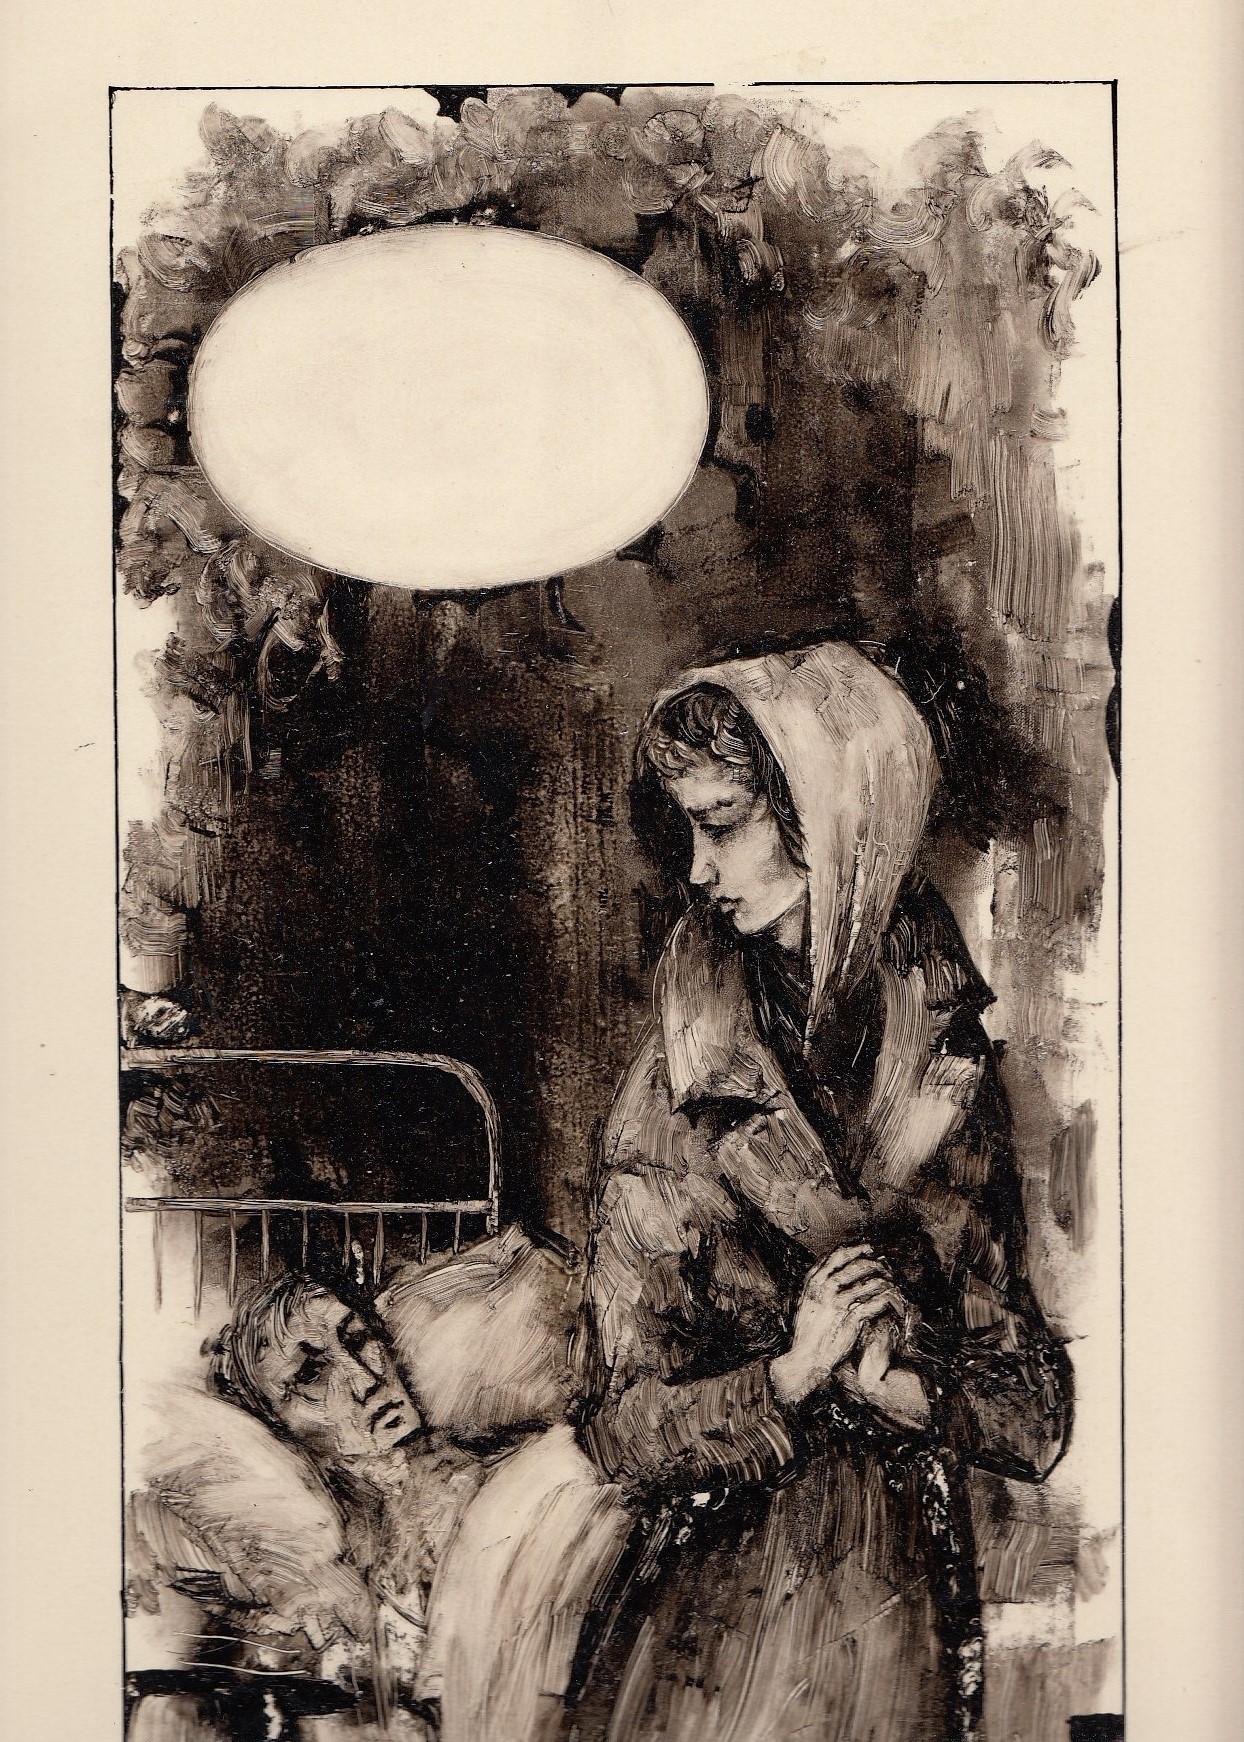 Orig.Tuschzeichnung. [Frau verläßt kranken Mann]. 23 x 38 cm Blattgröße.